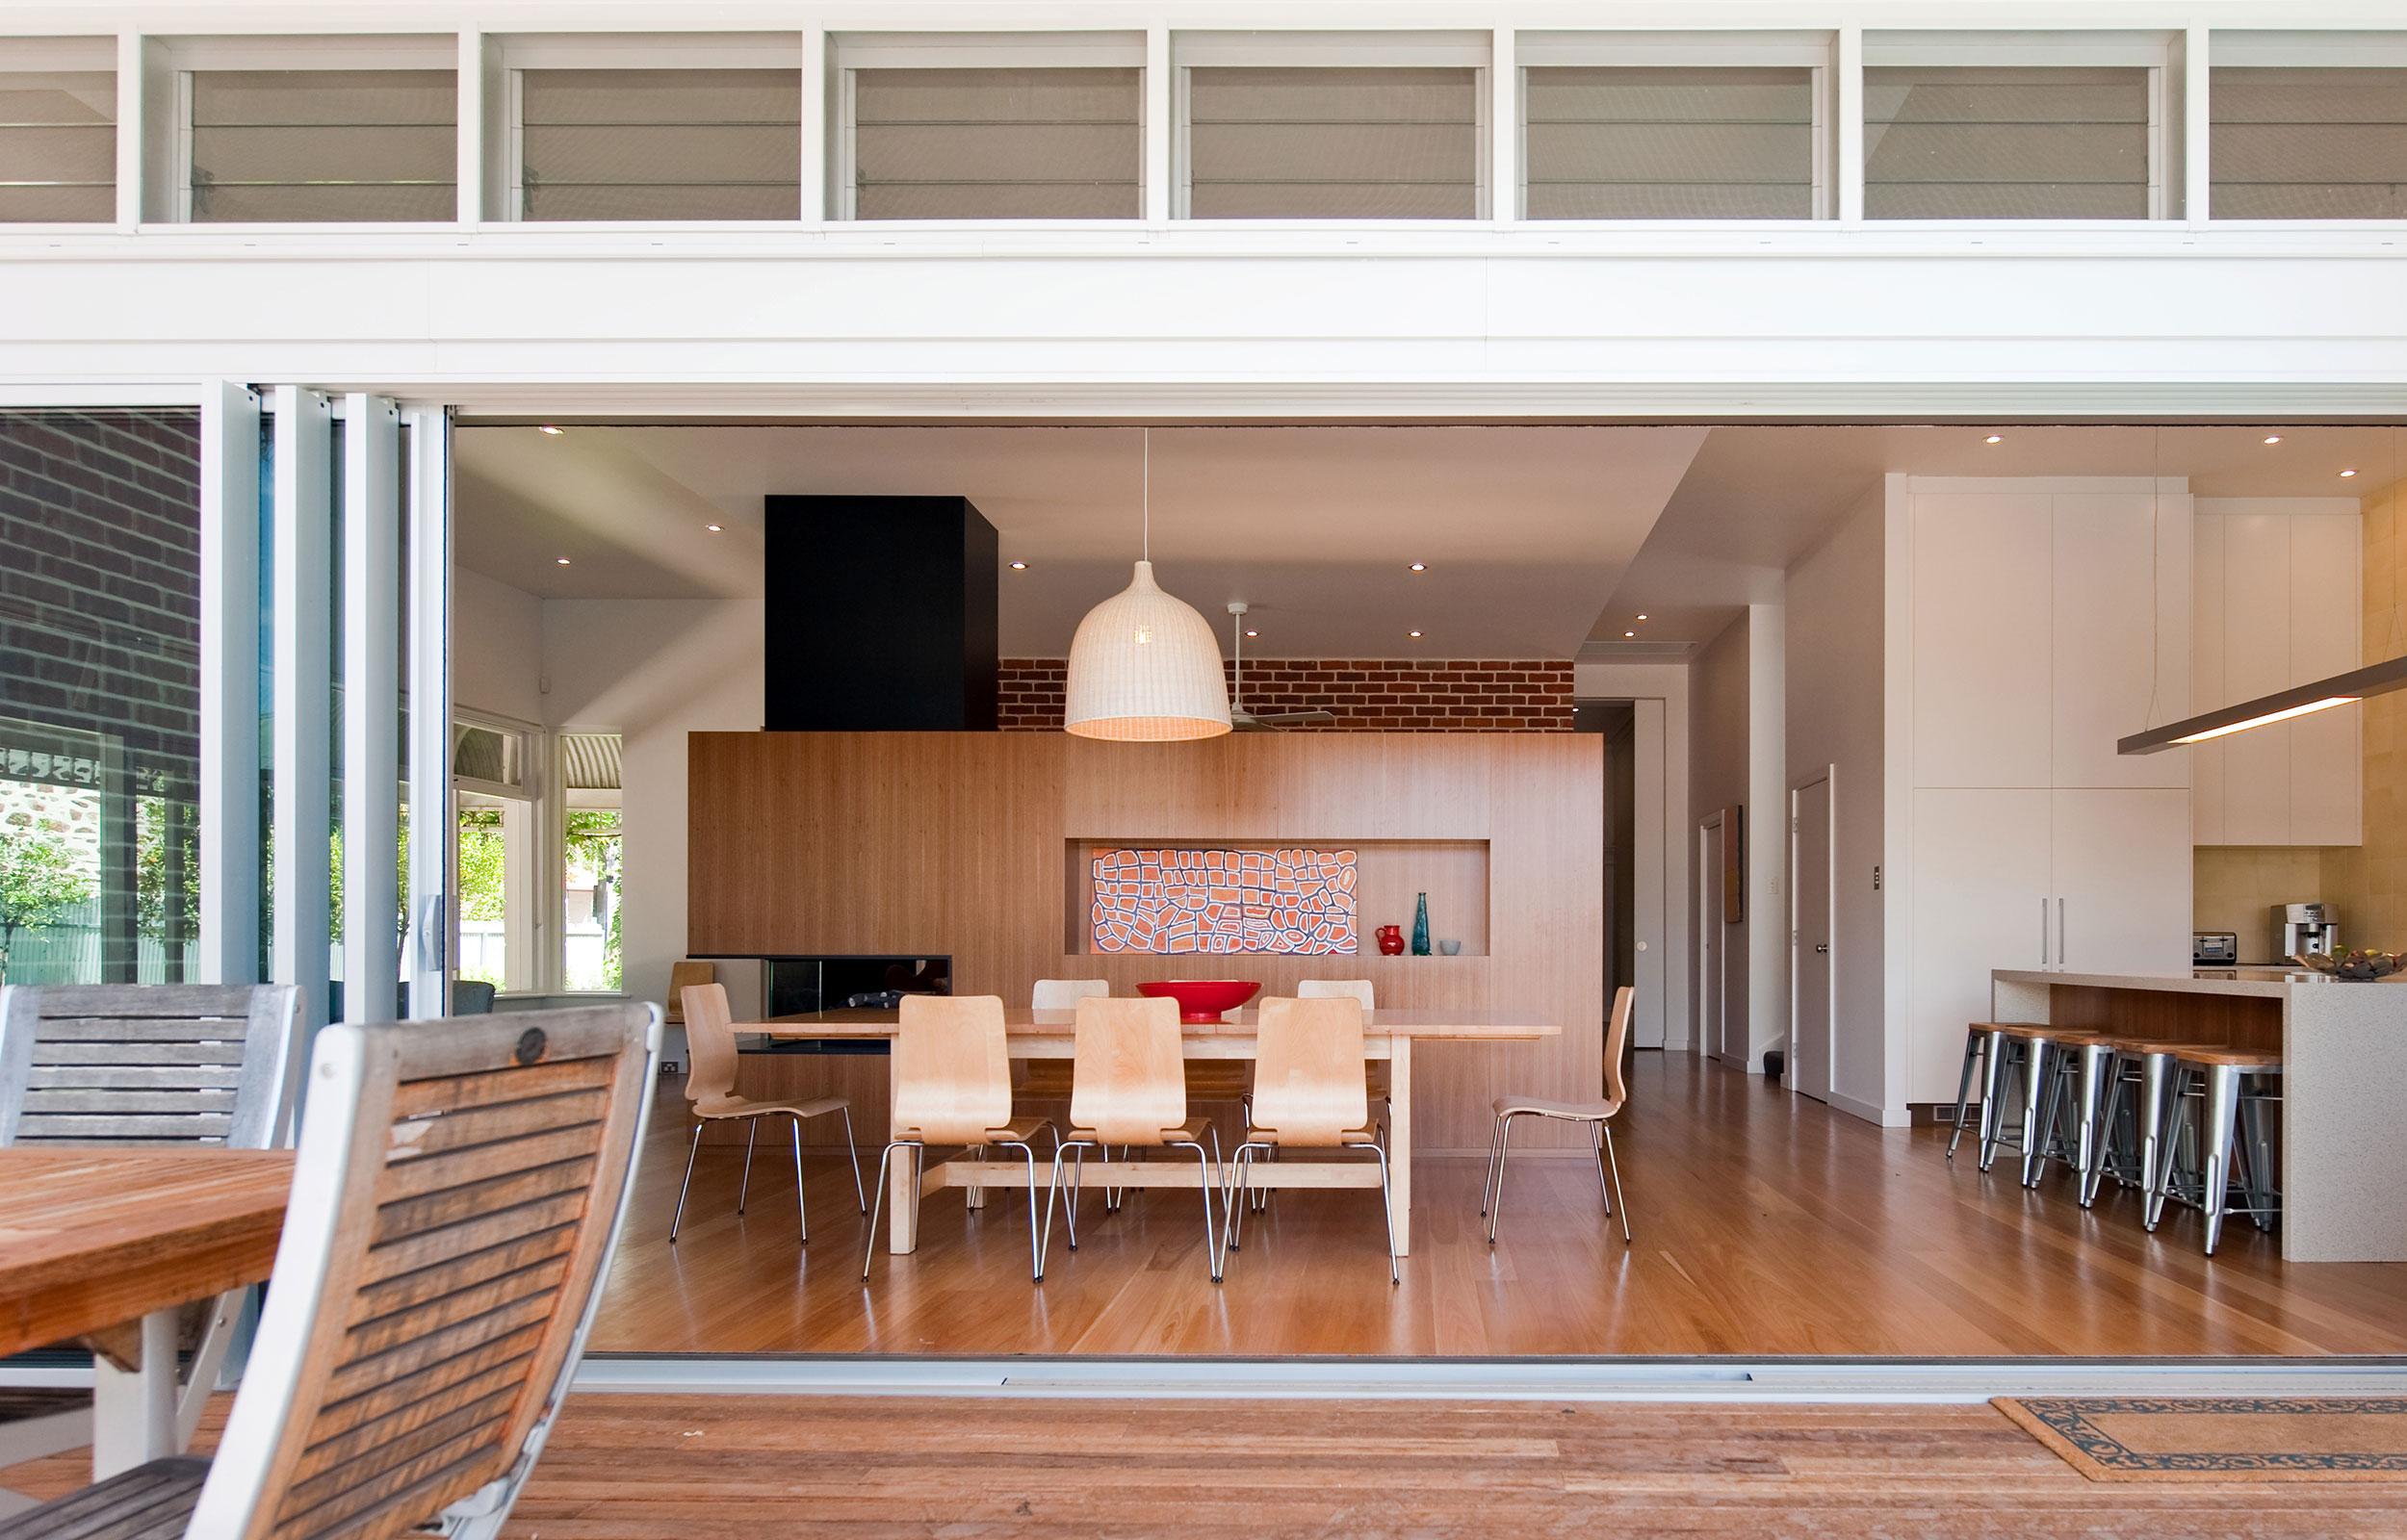 enoki-interior-Halbert-1.jpg